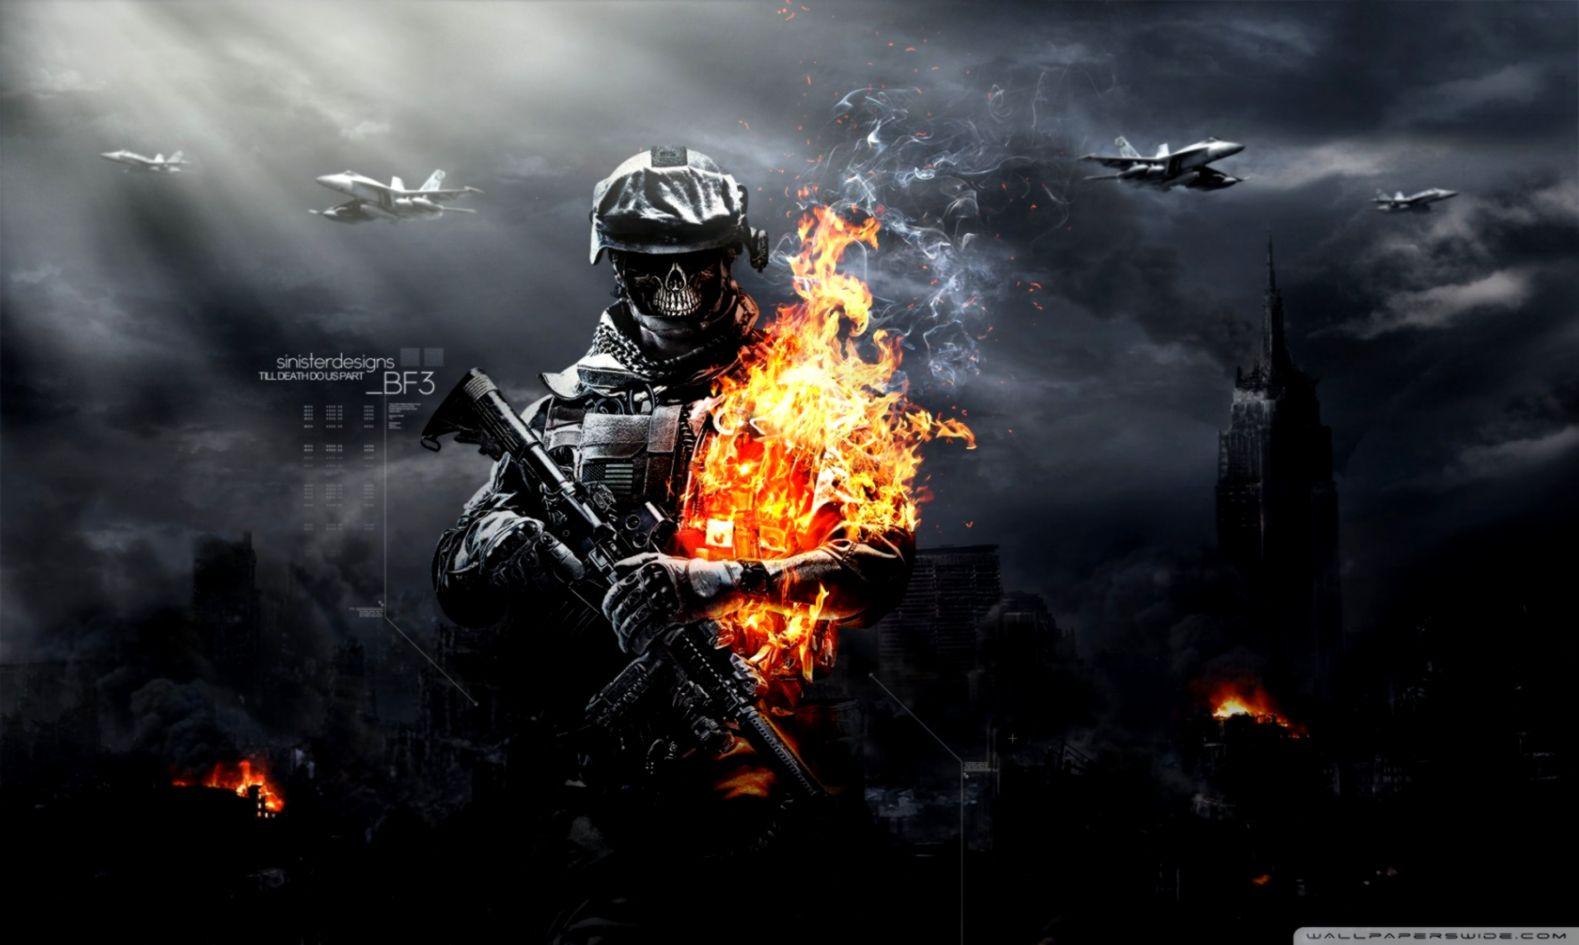 New Battlefield 3 Wallpapers Hd Info Wallpapers